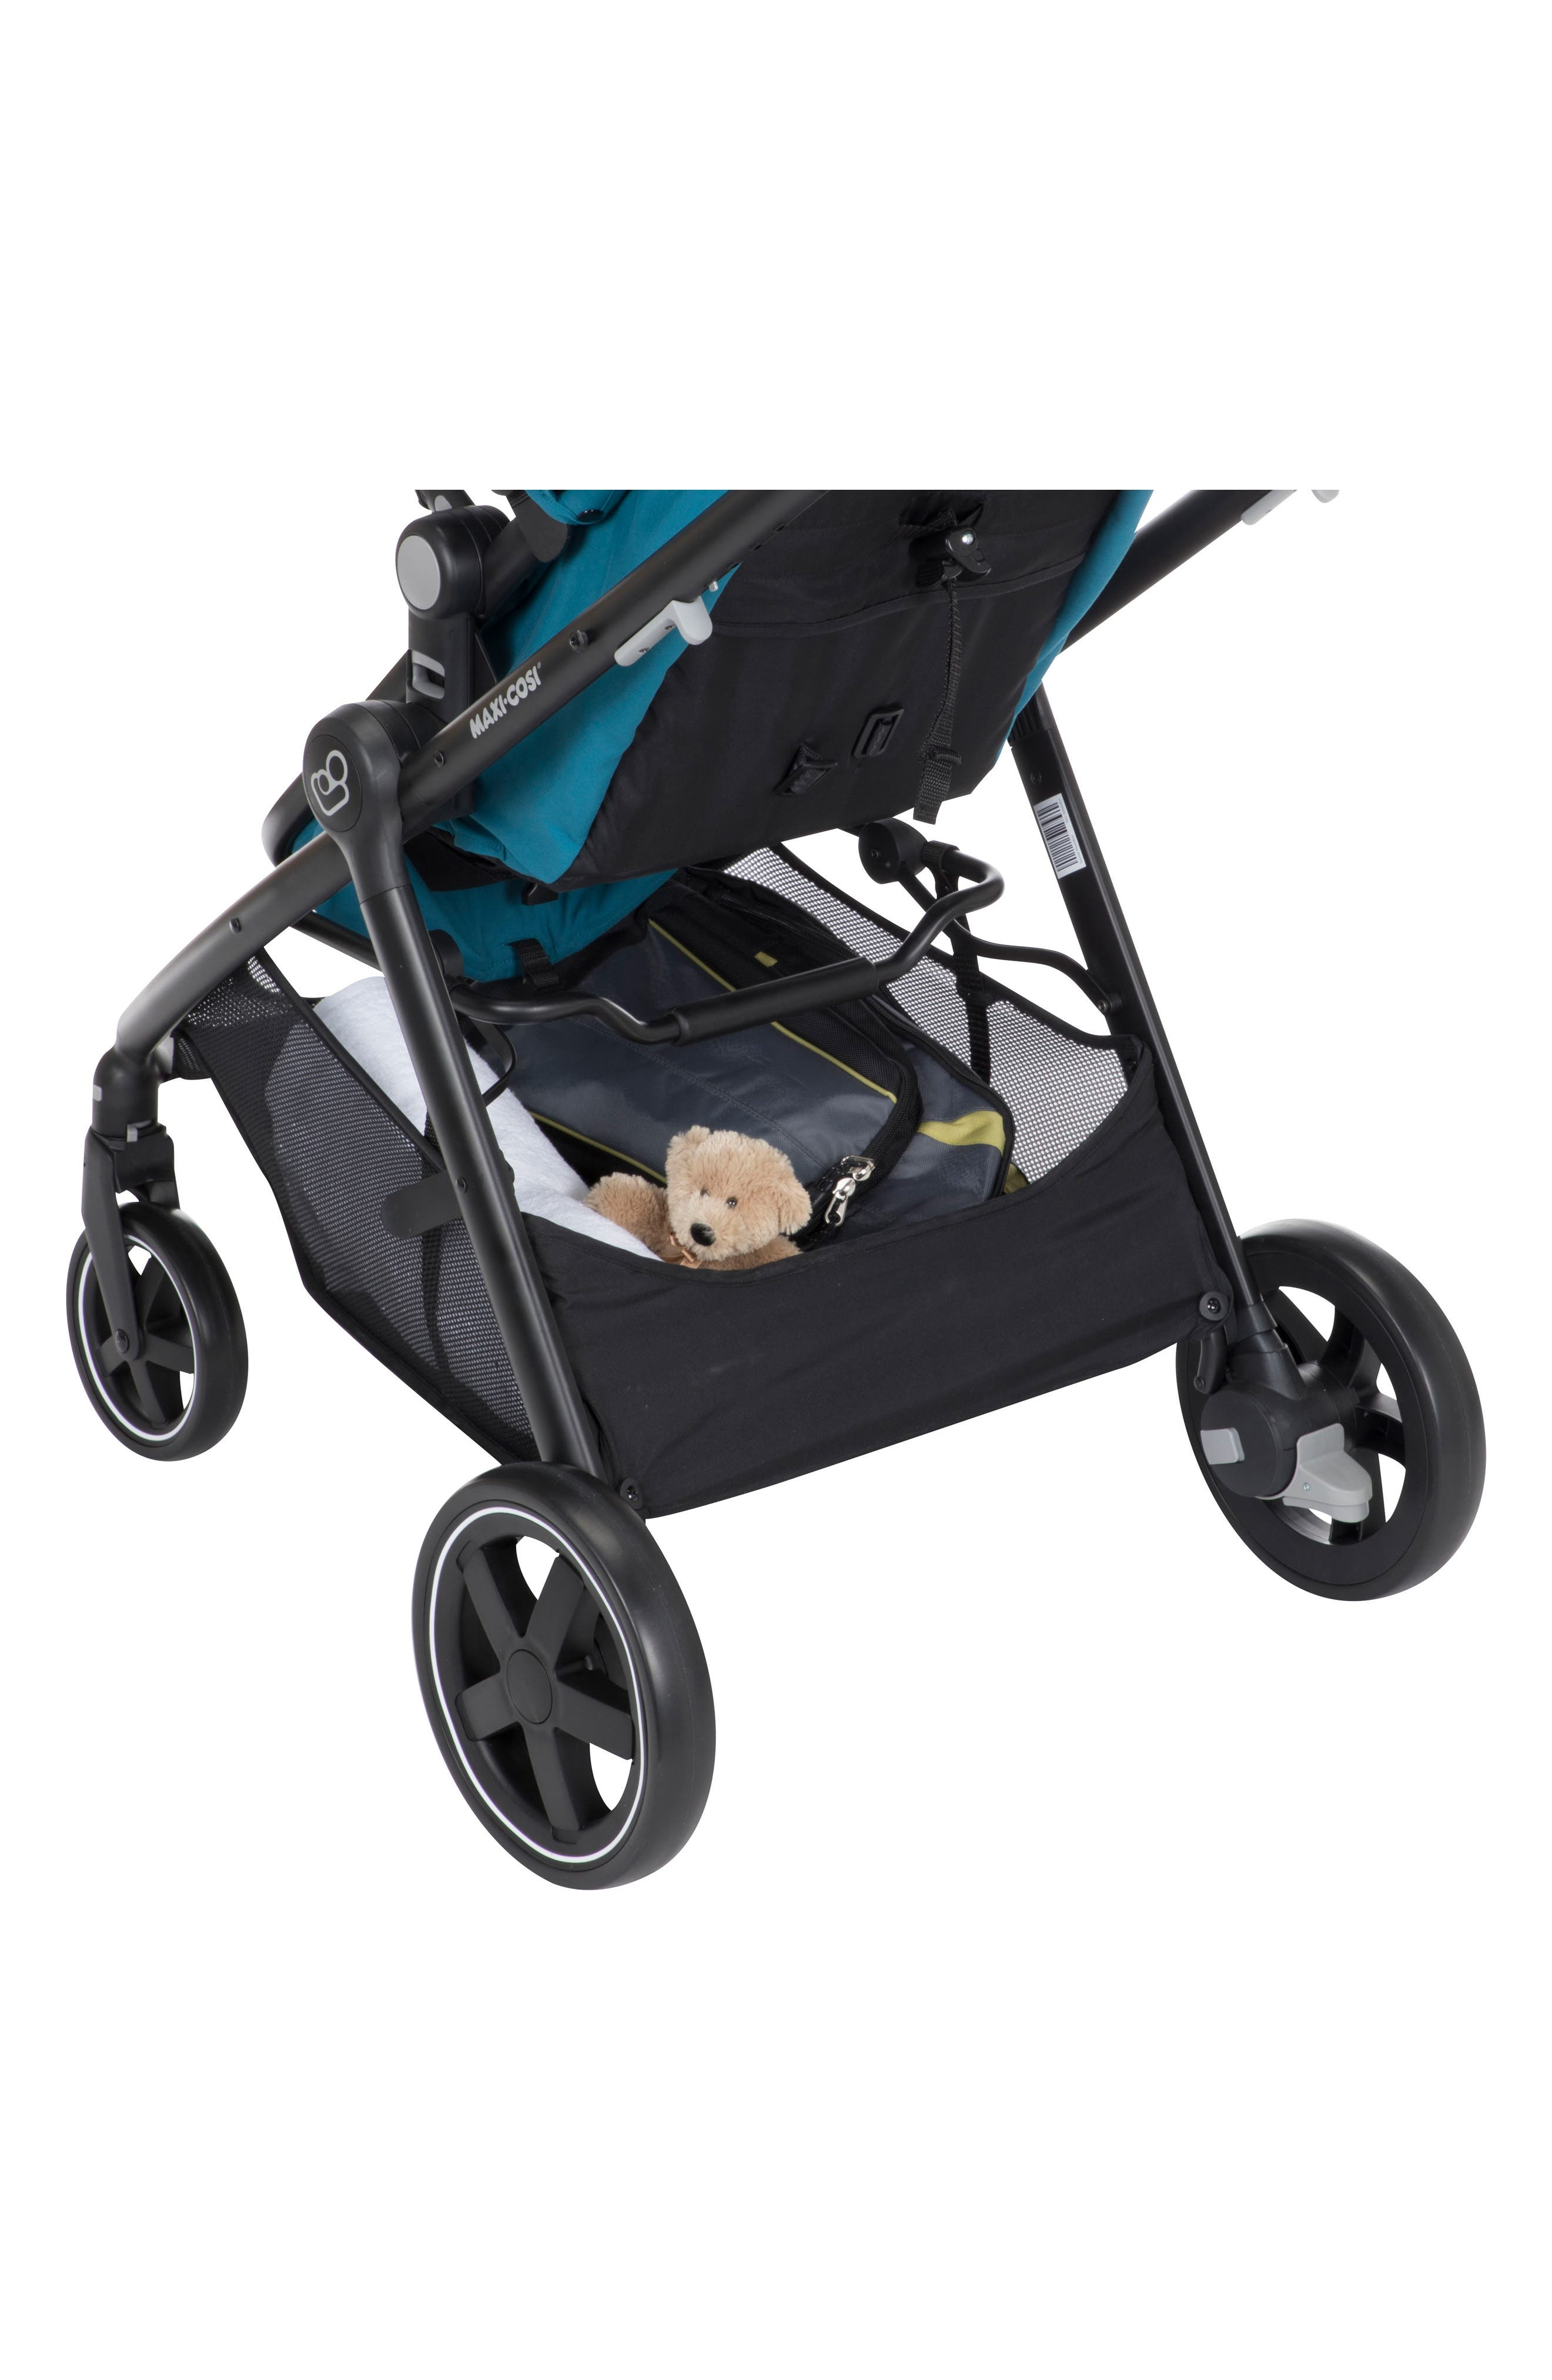 5-1 Mico 30 Infant Car Seat & Zelia Stroller Modular Travel System,                             Alternate thumbnail 11, color,                             Emerald Tide